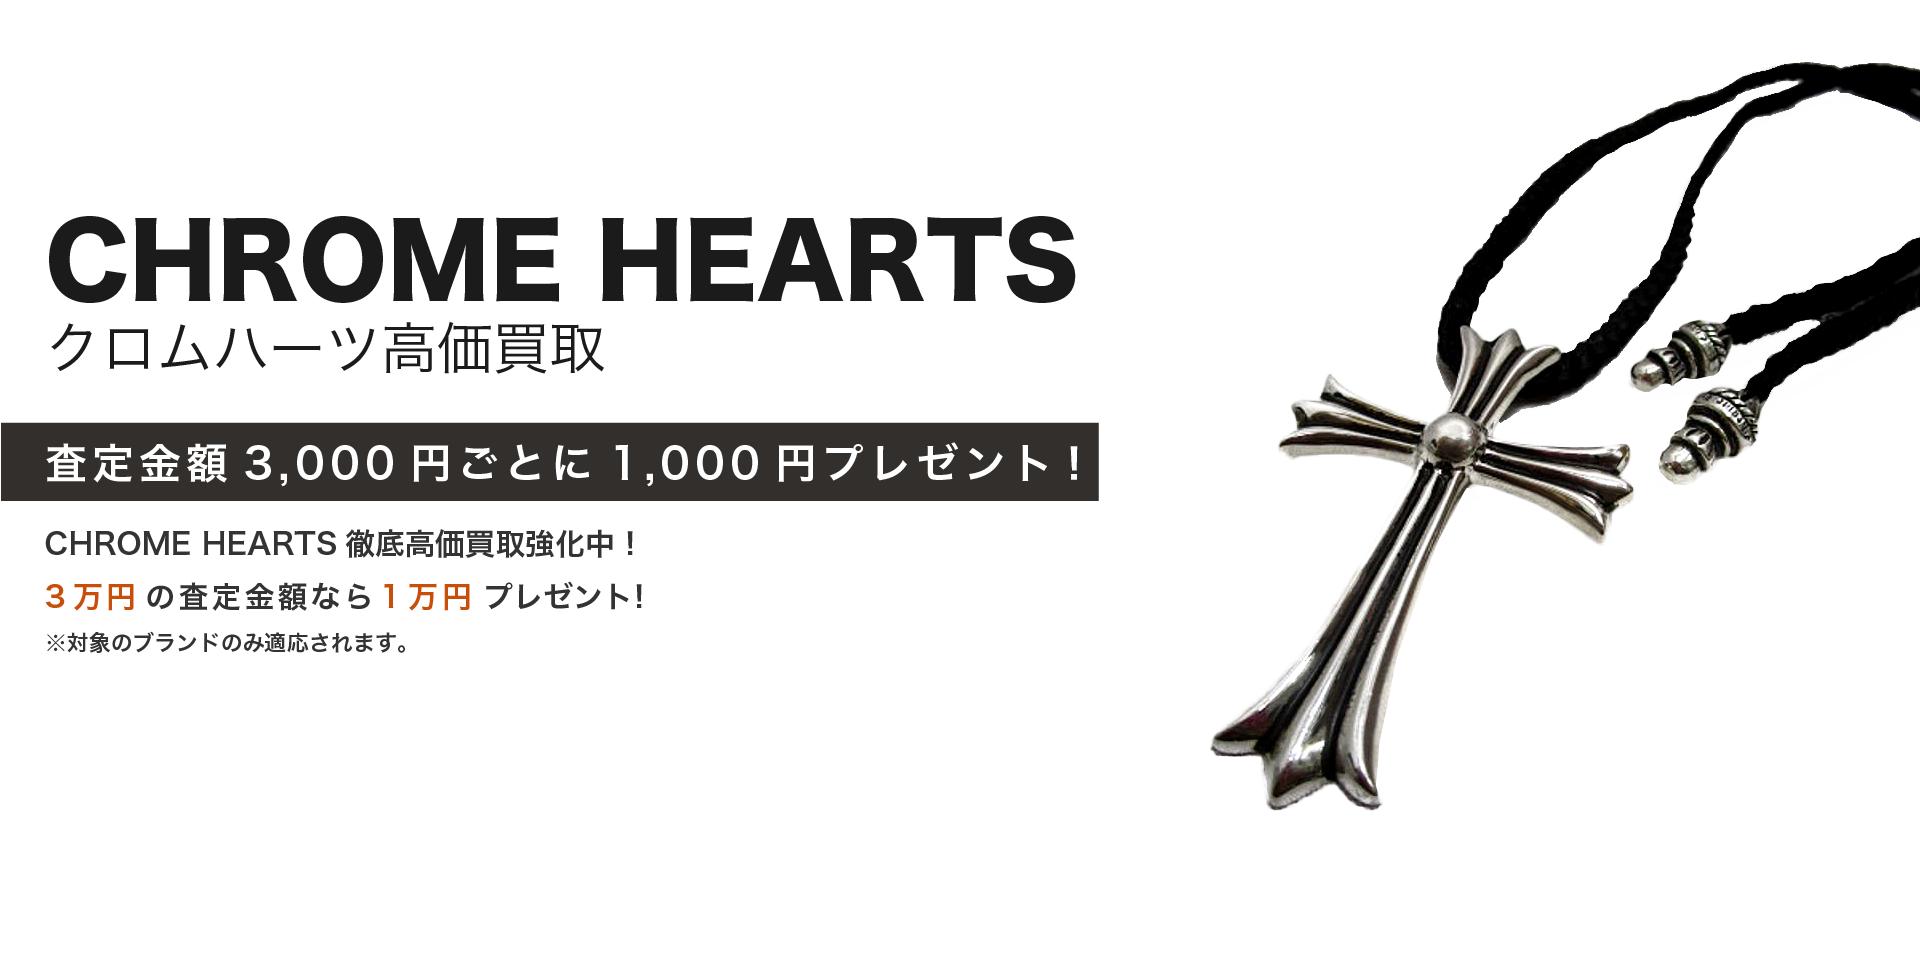 CHROME HEARTSのキービジュアル